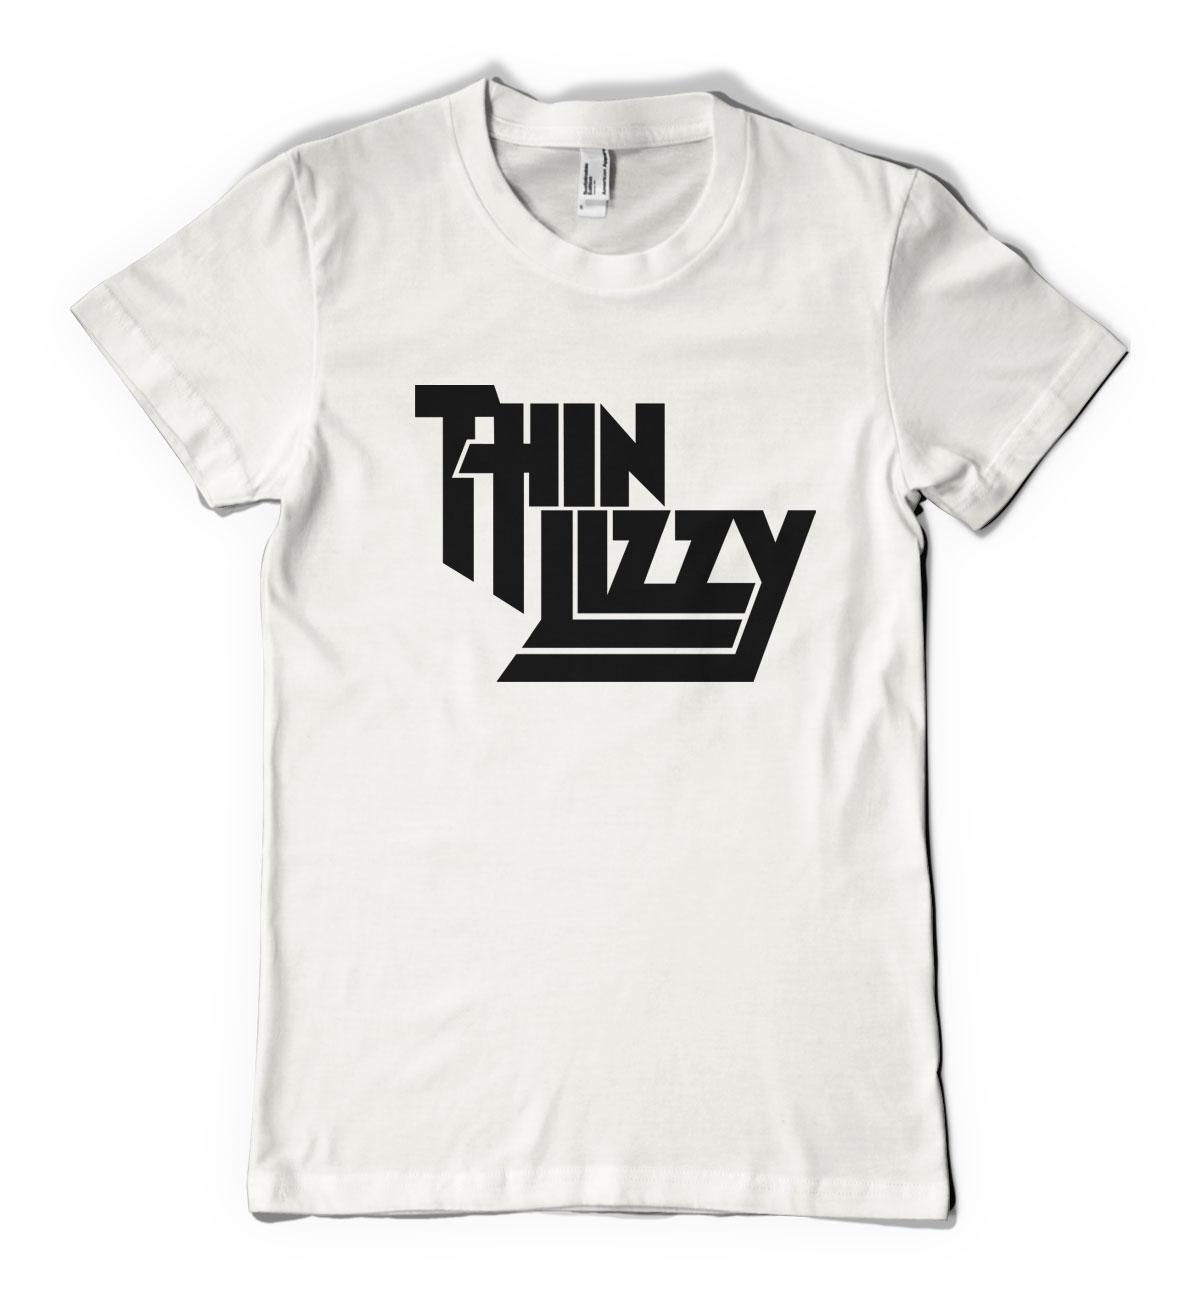 Thin Lizzy T Shirts Vintage T Shirts Online Blog